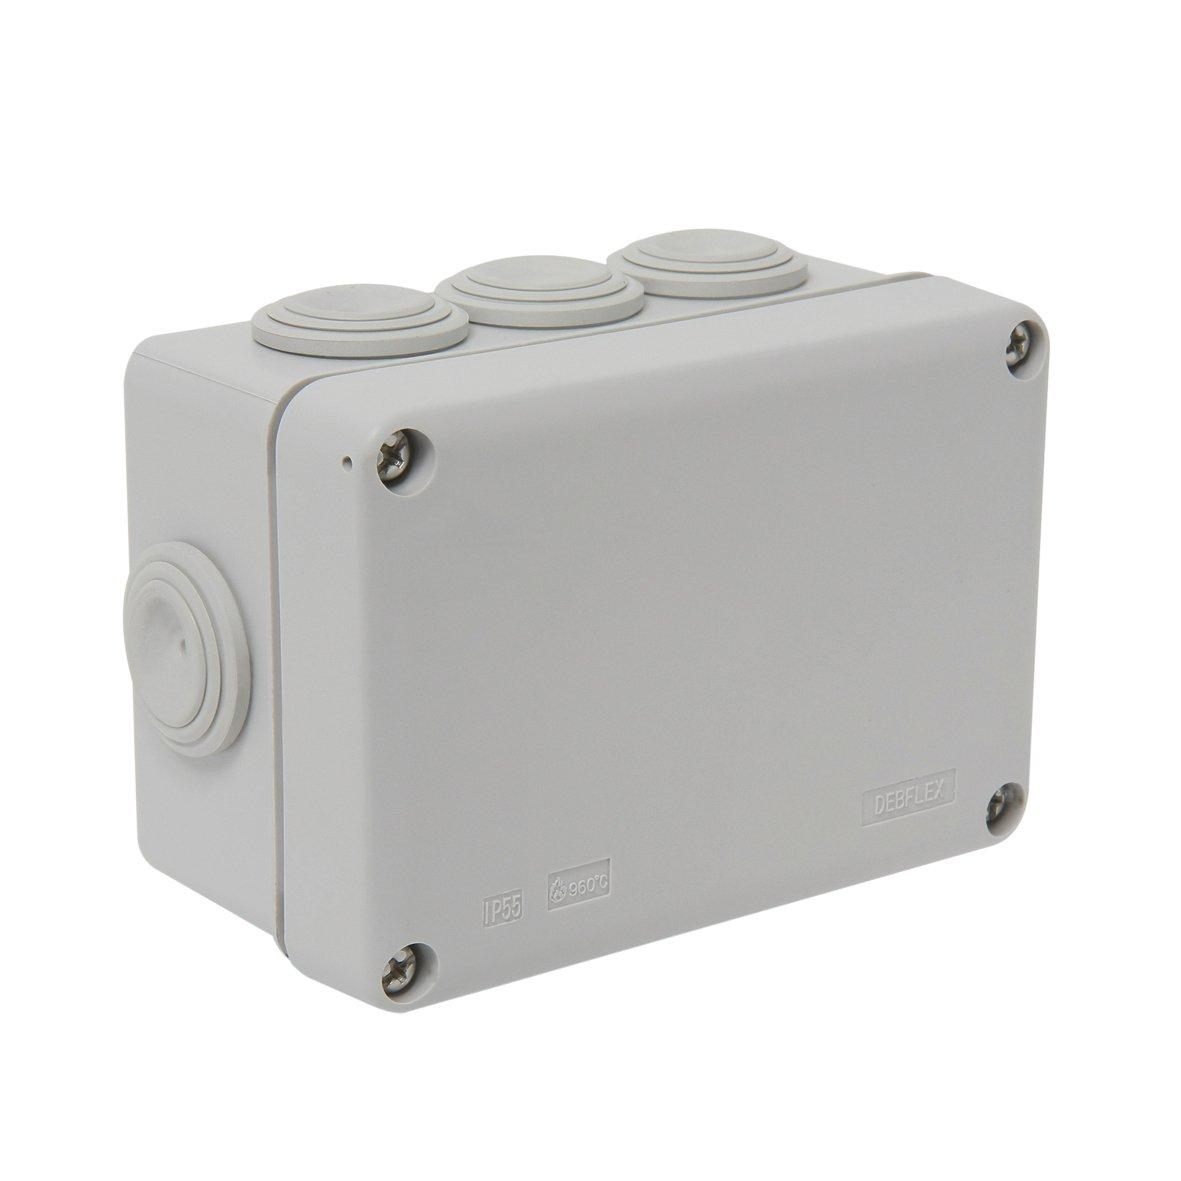 Debflex 718040 Junction Box IP55 110 x 80/P50 Grey